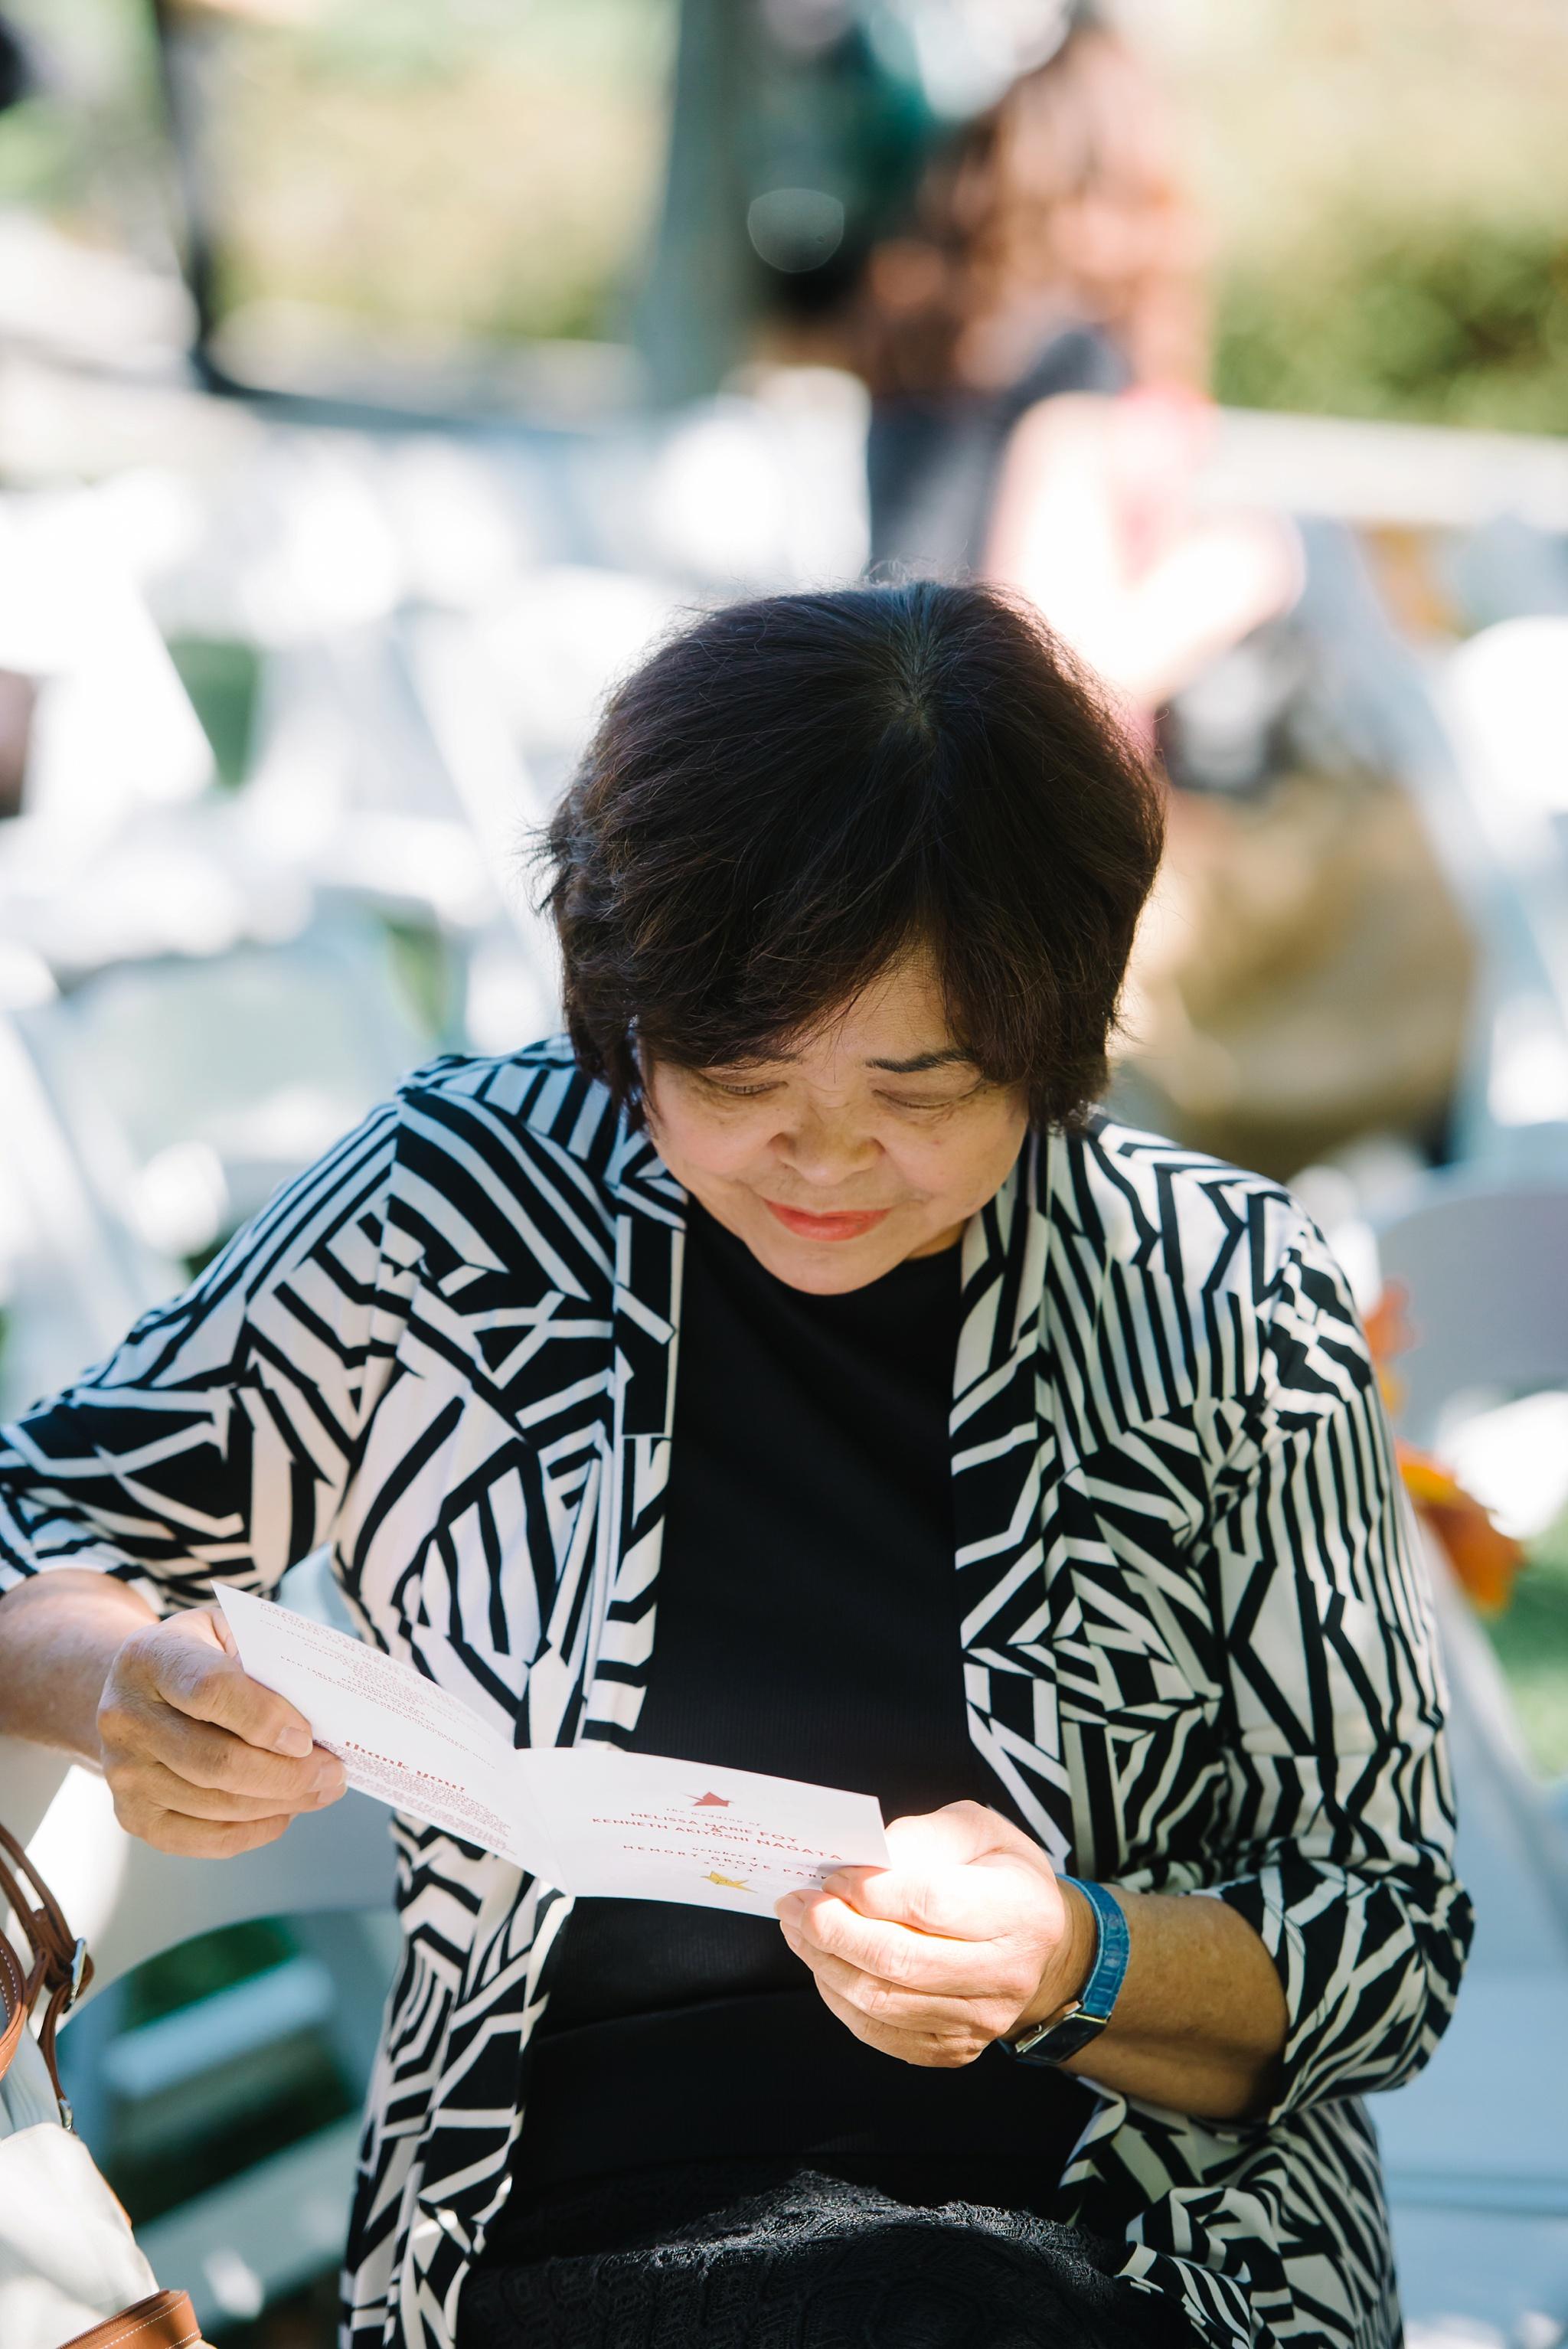 Park City Wedding Photographer Ali Sumsion 024